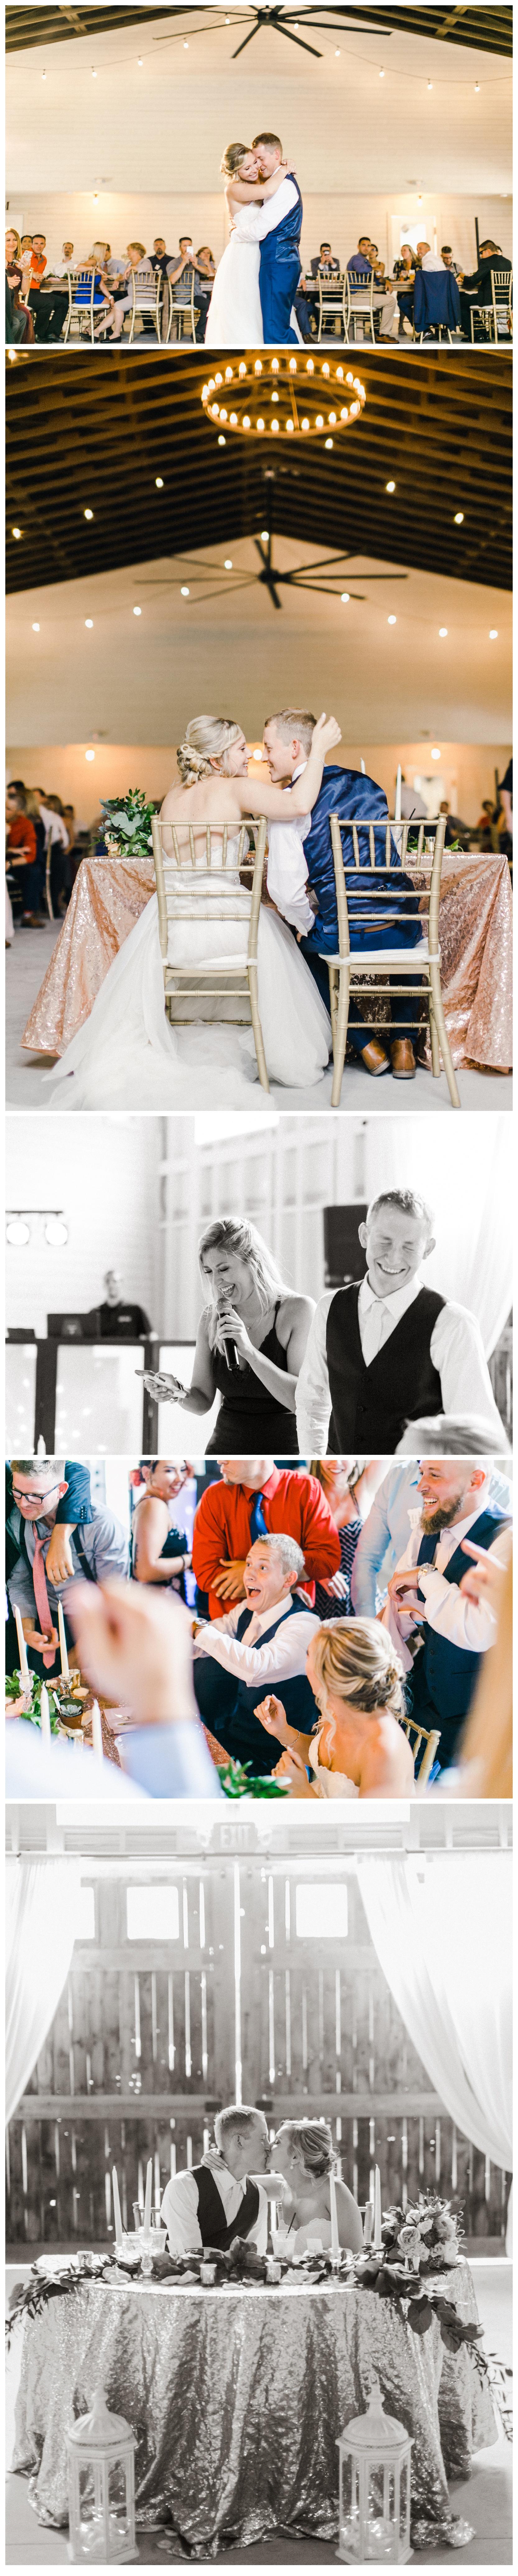 the mulberry new smyrna beach florida wedding photos